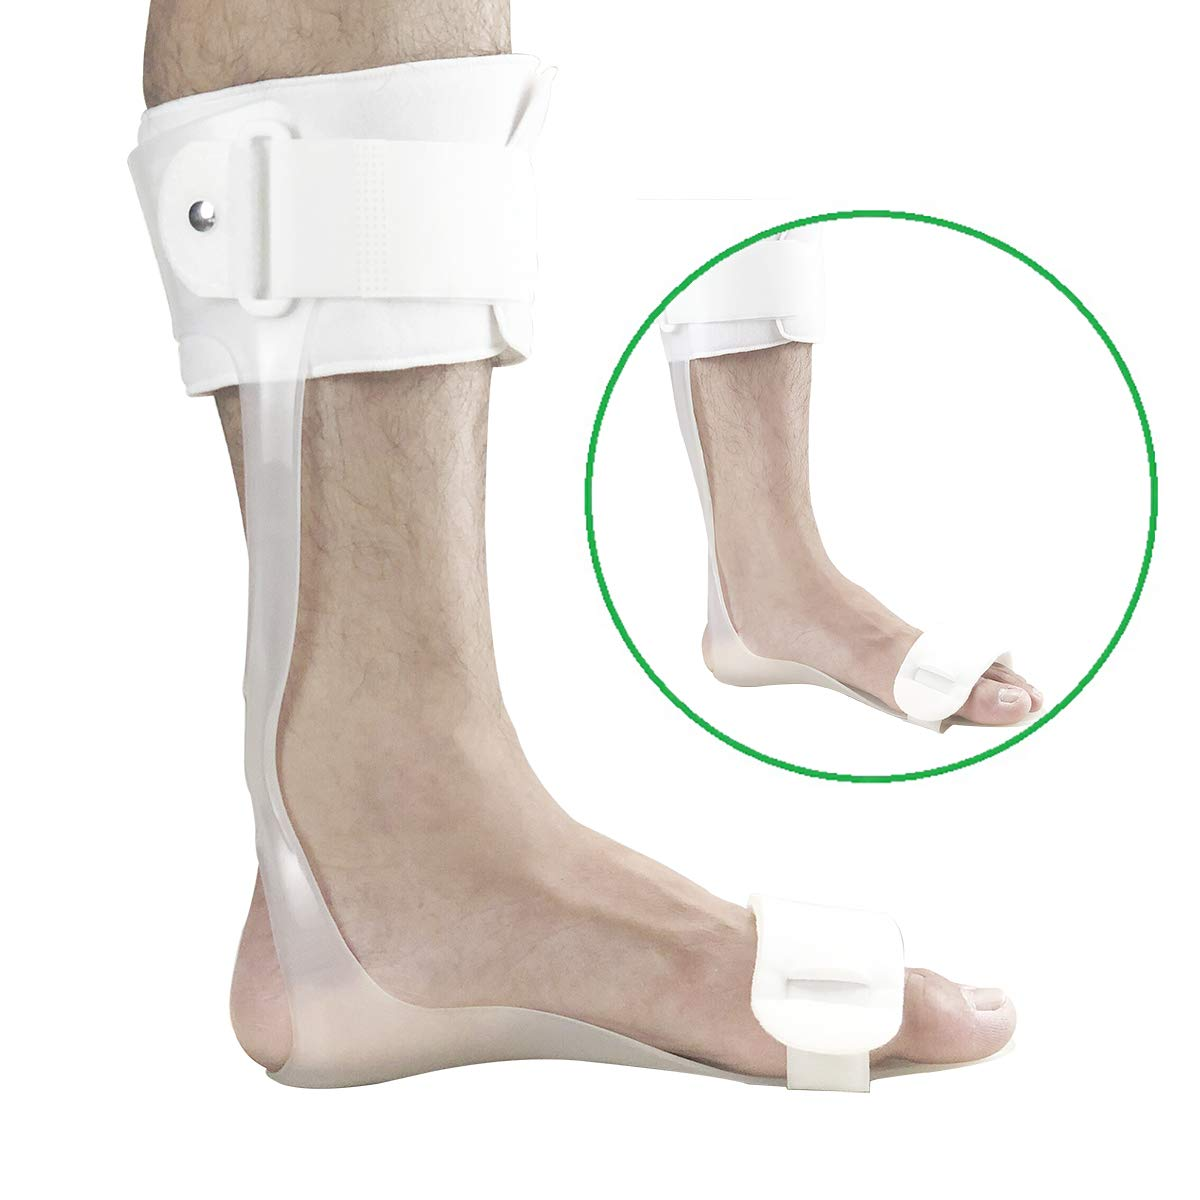 Orthomen Drop Foot Brace AFO Leaf Spring Splint (XL-Right) by Orthomen